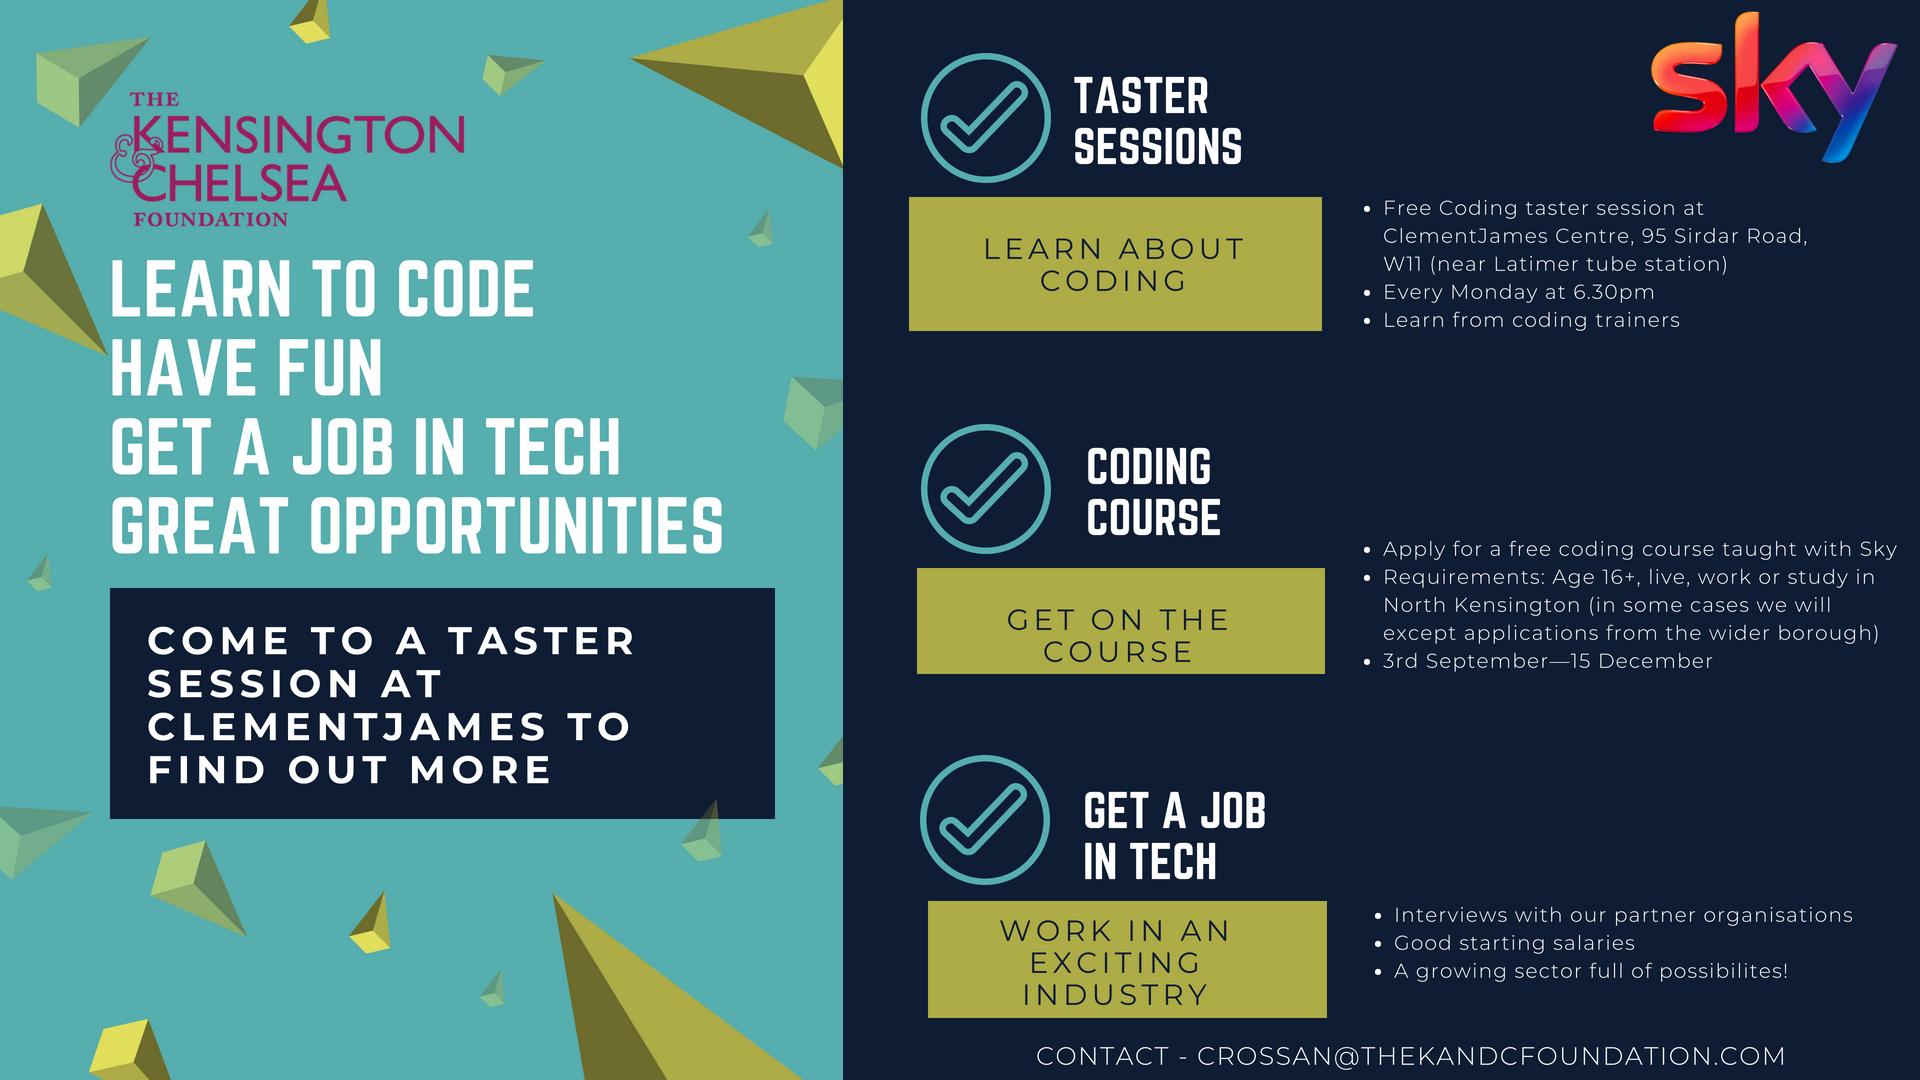 Get into Tech leaflet